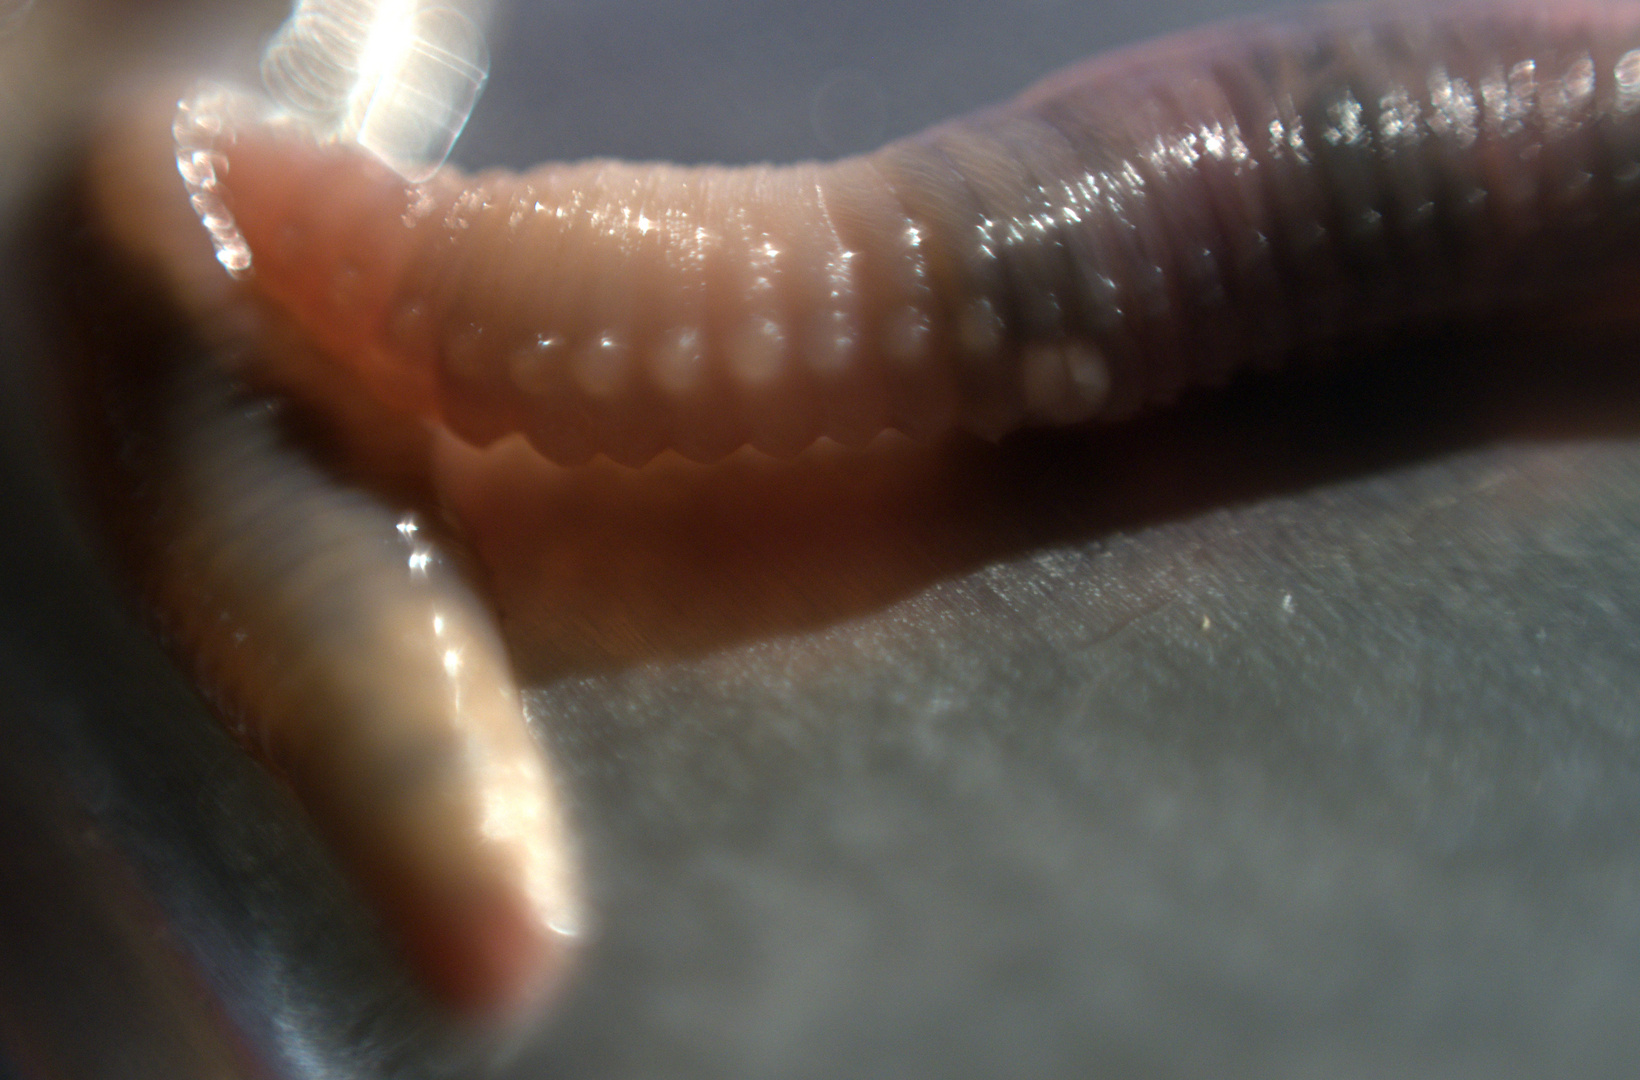 Worms Cuddling, 2010